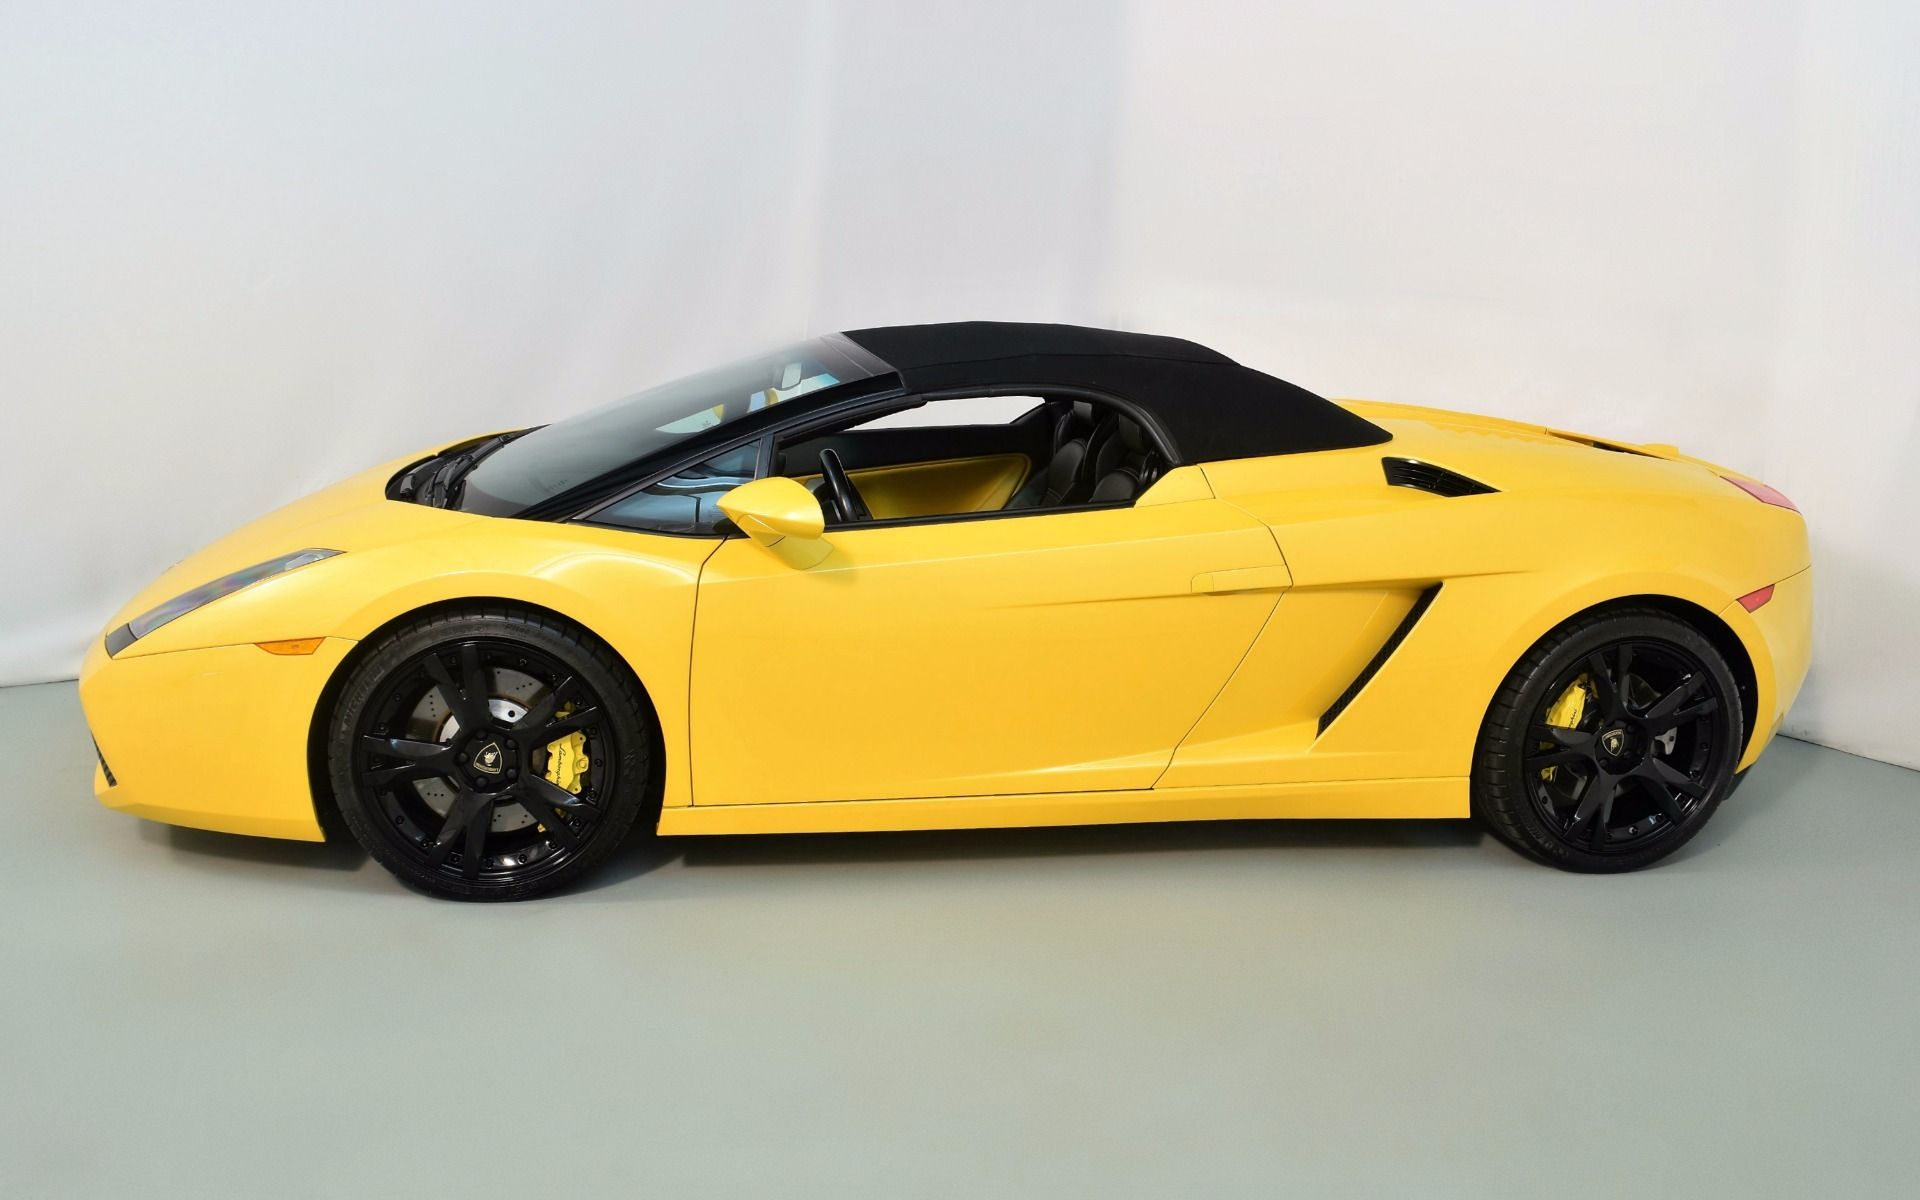 Lamborghini gallardo coupé | need for speed wiki | fandom